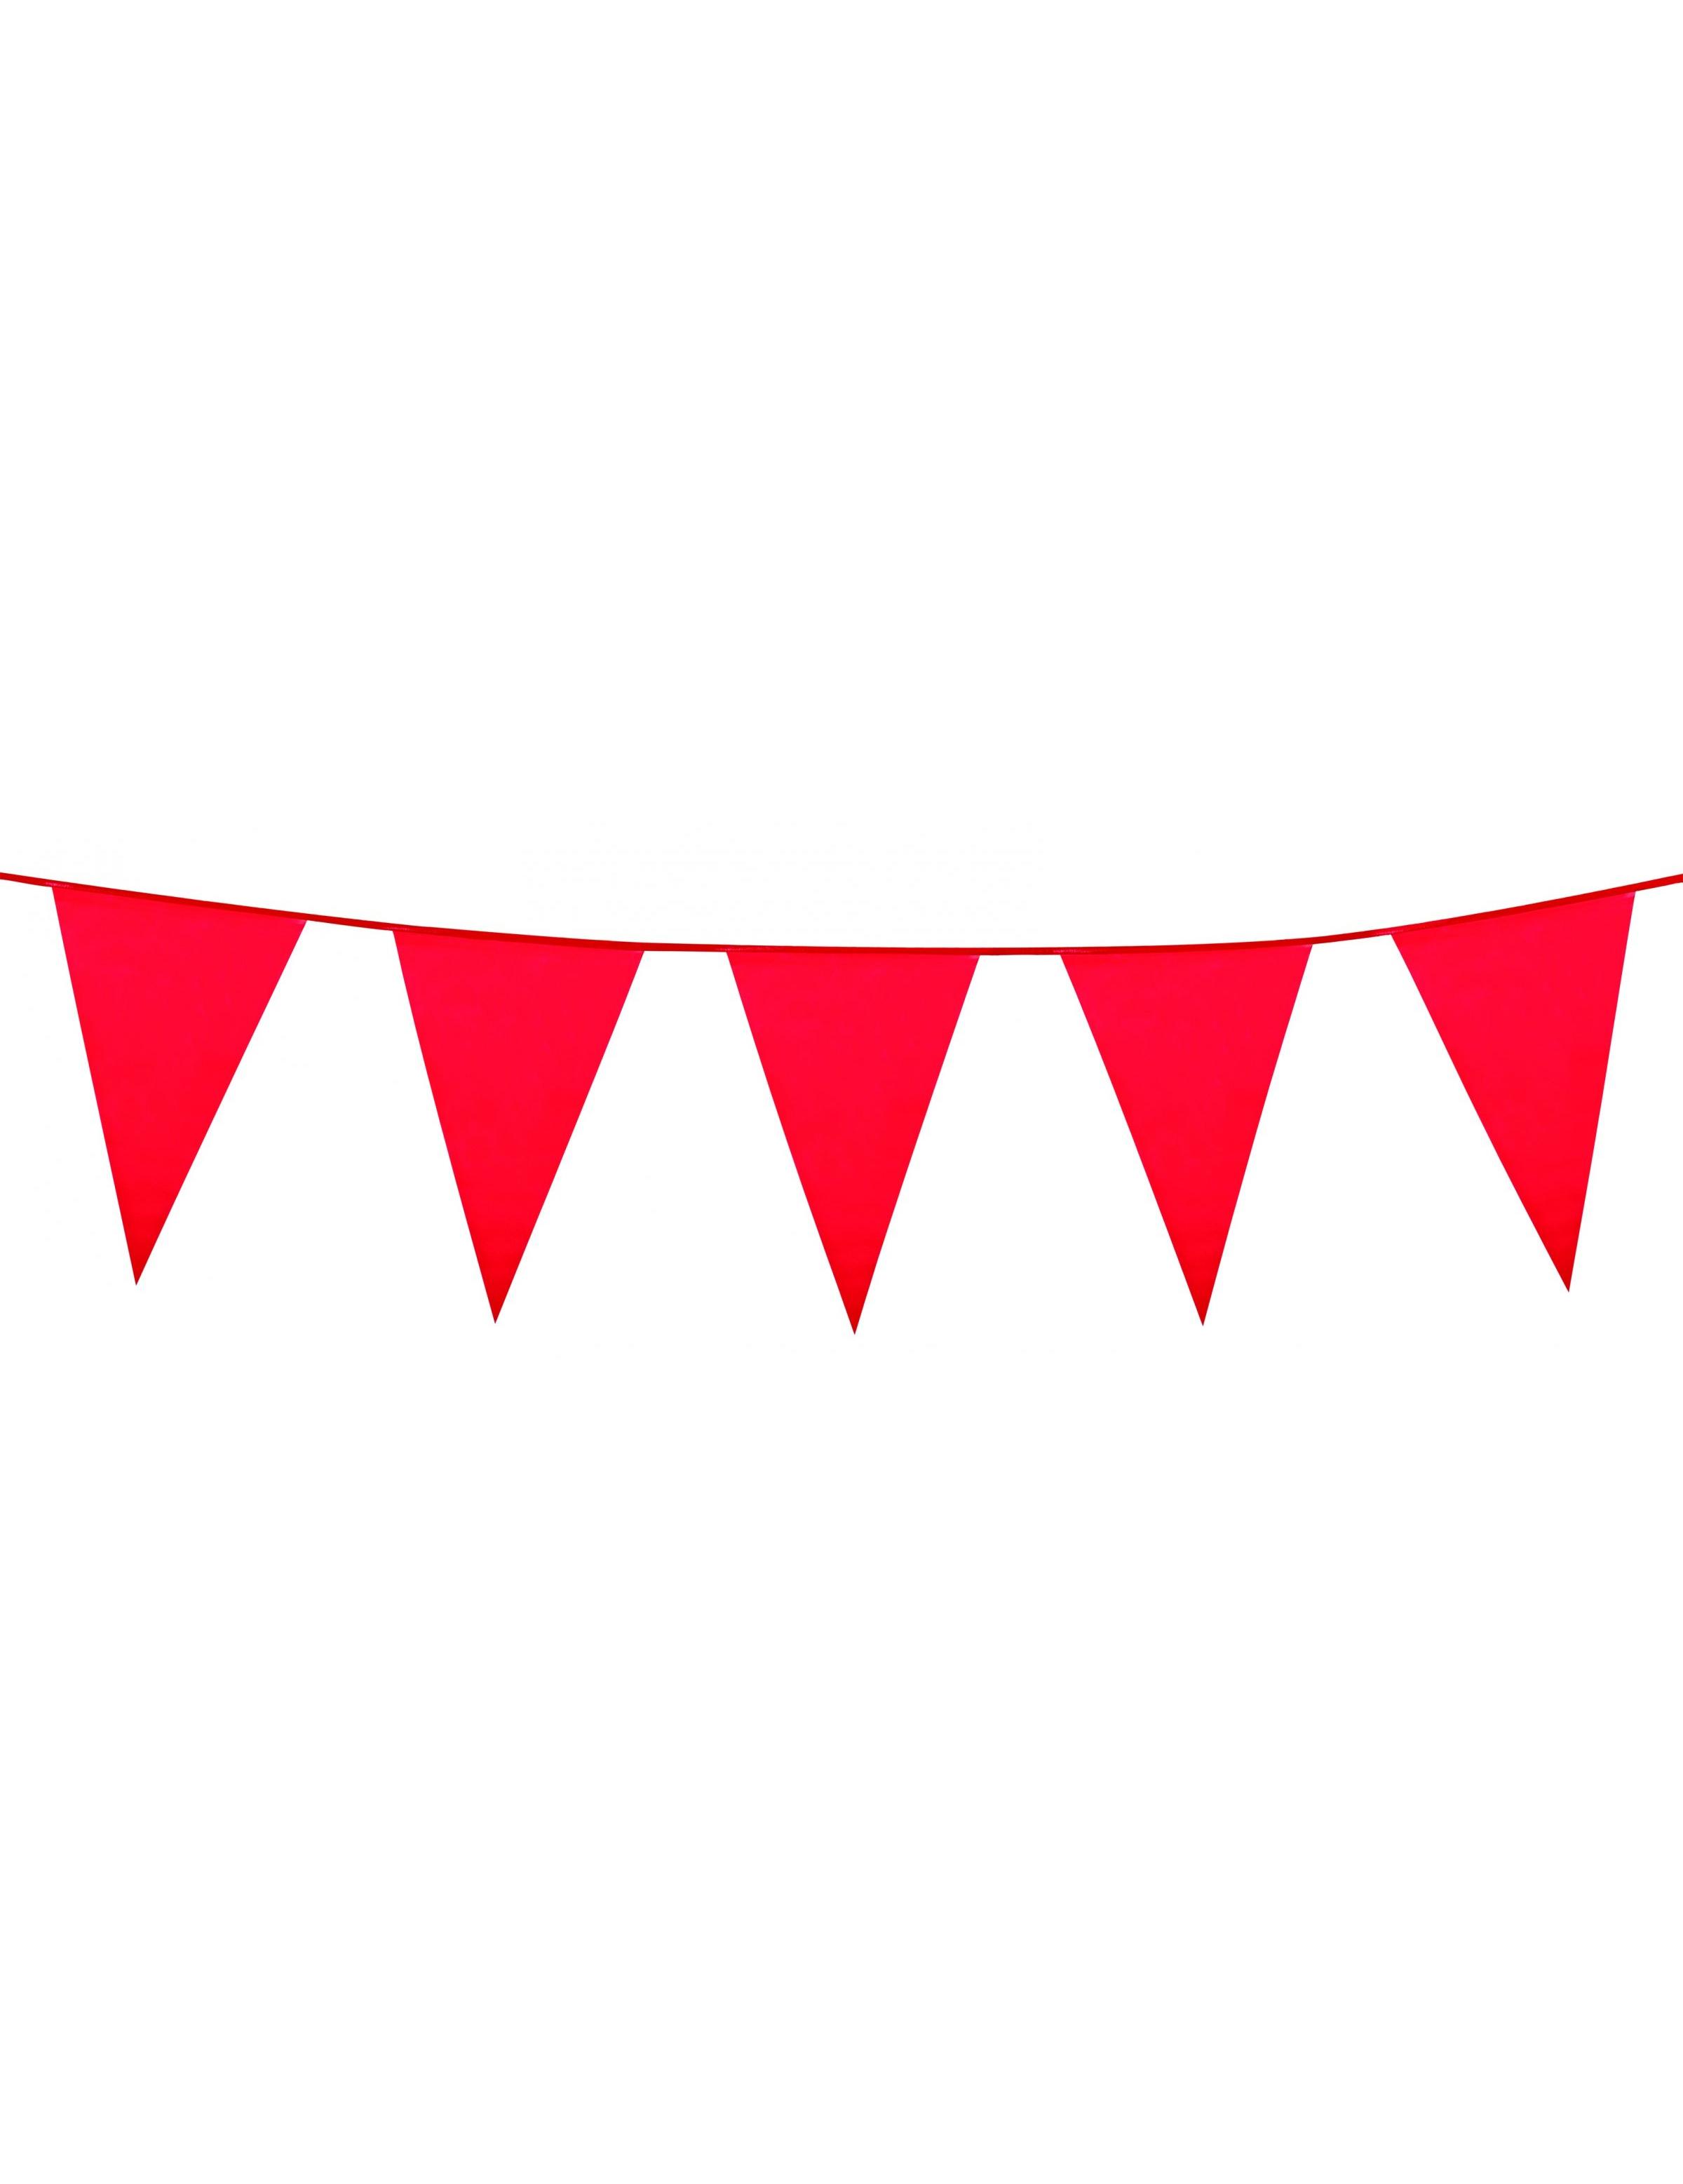 guirlande-fanions-rouge_205103_2.jpg